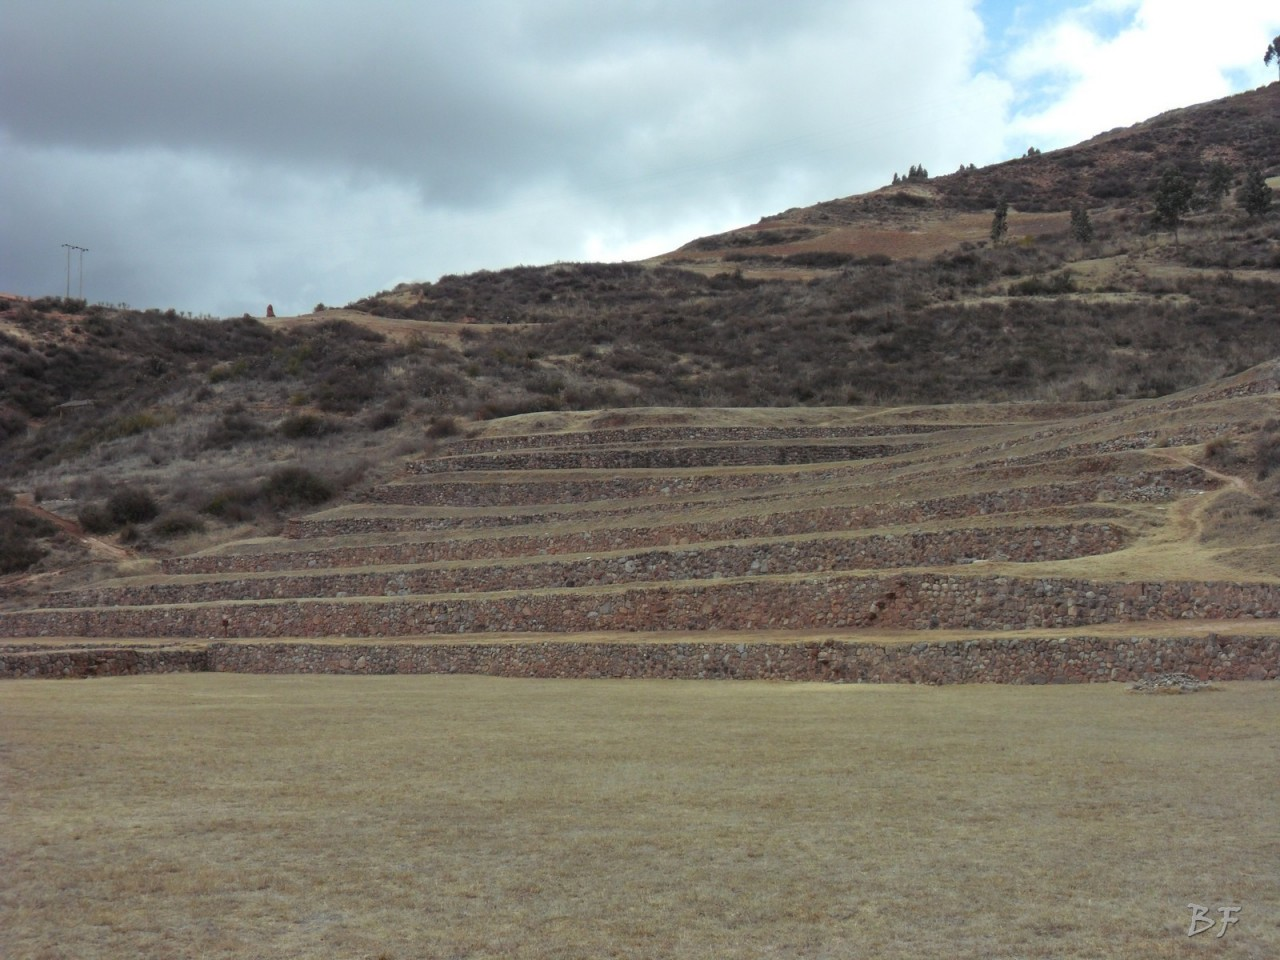 Terrazze-Circolari-Megaliti-Moray-Saline-Maras-Cusco-Perù-6